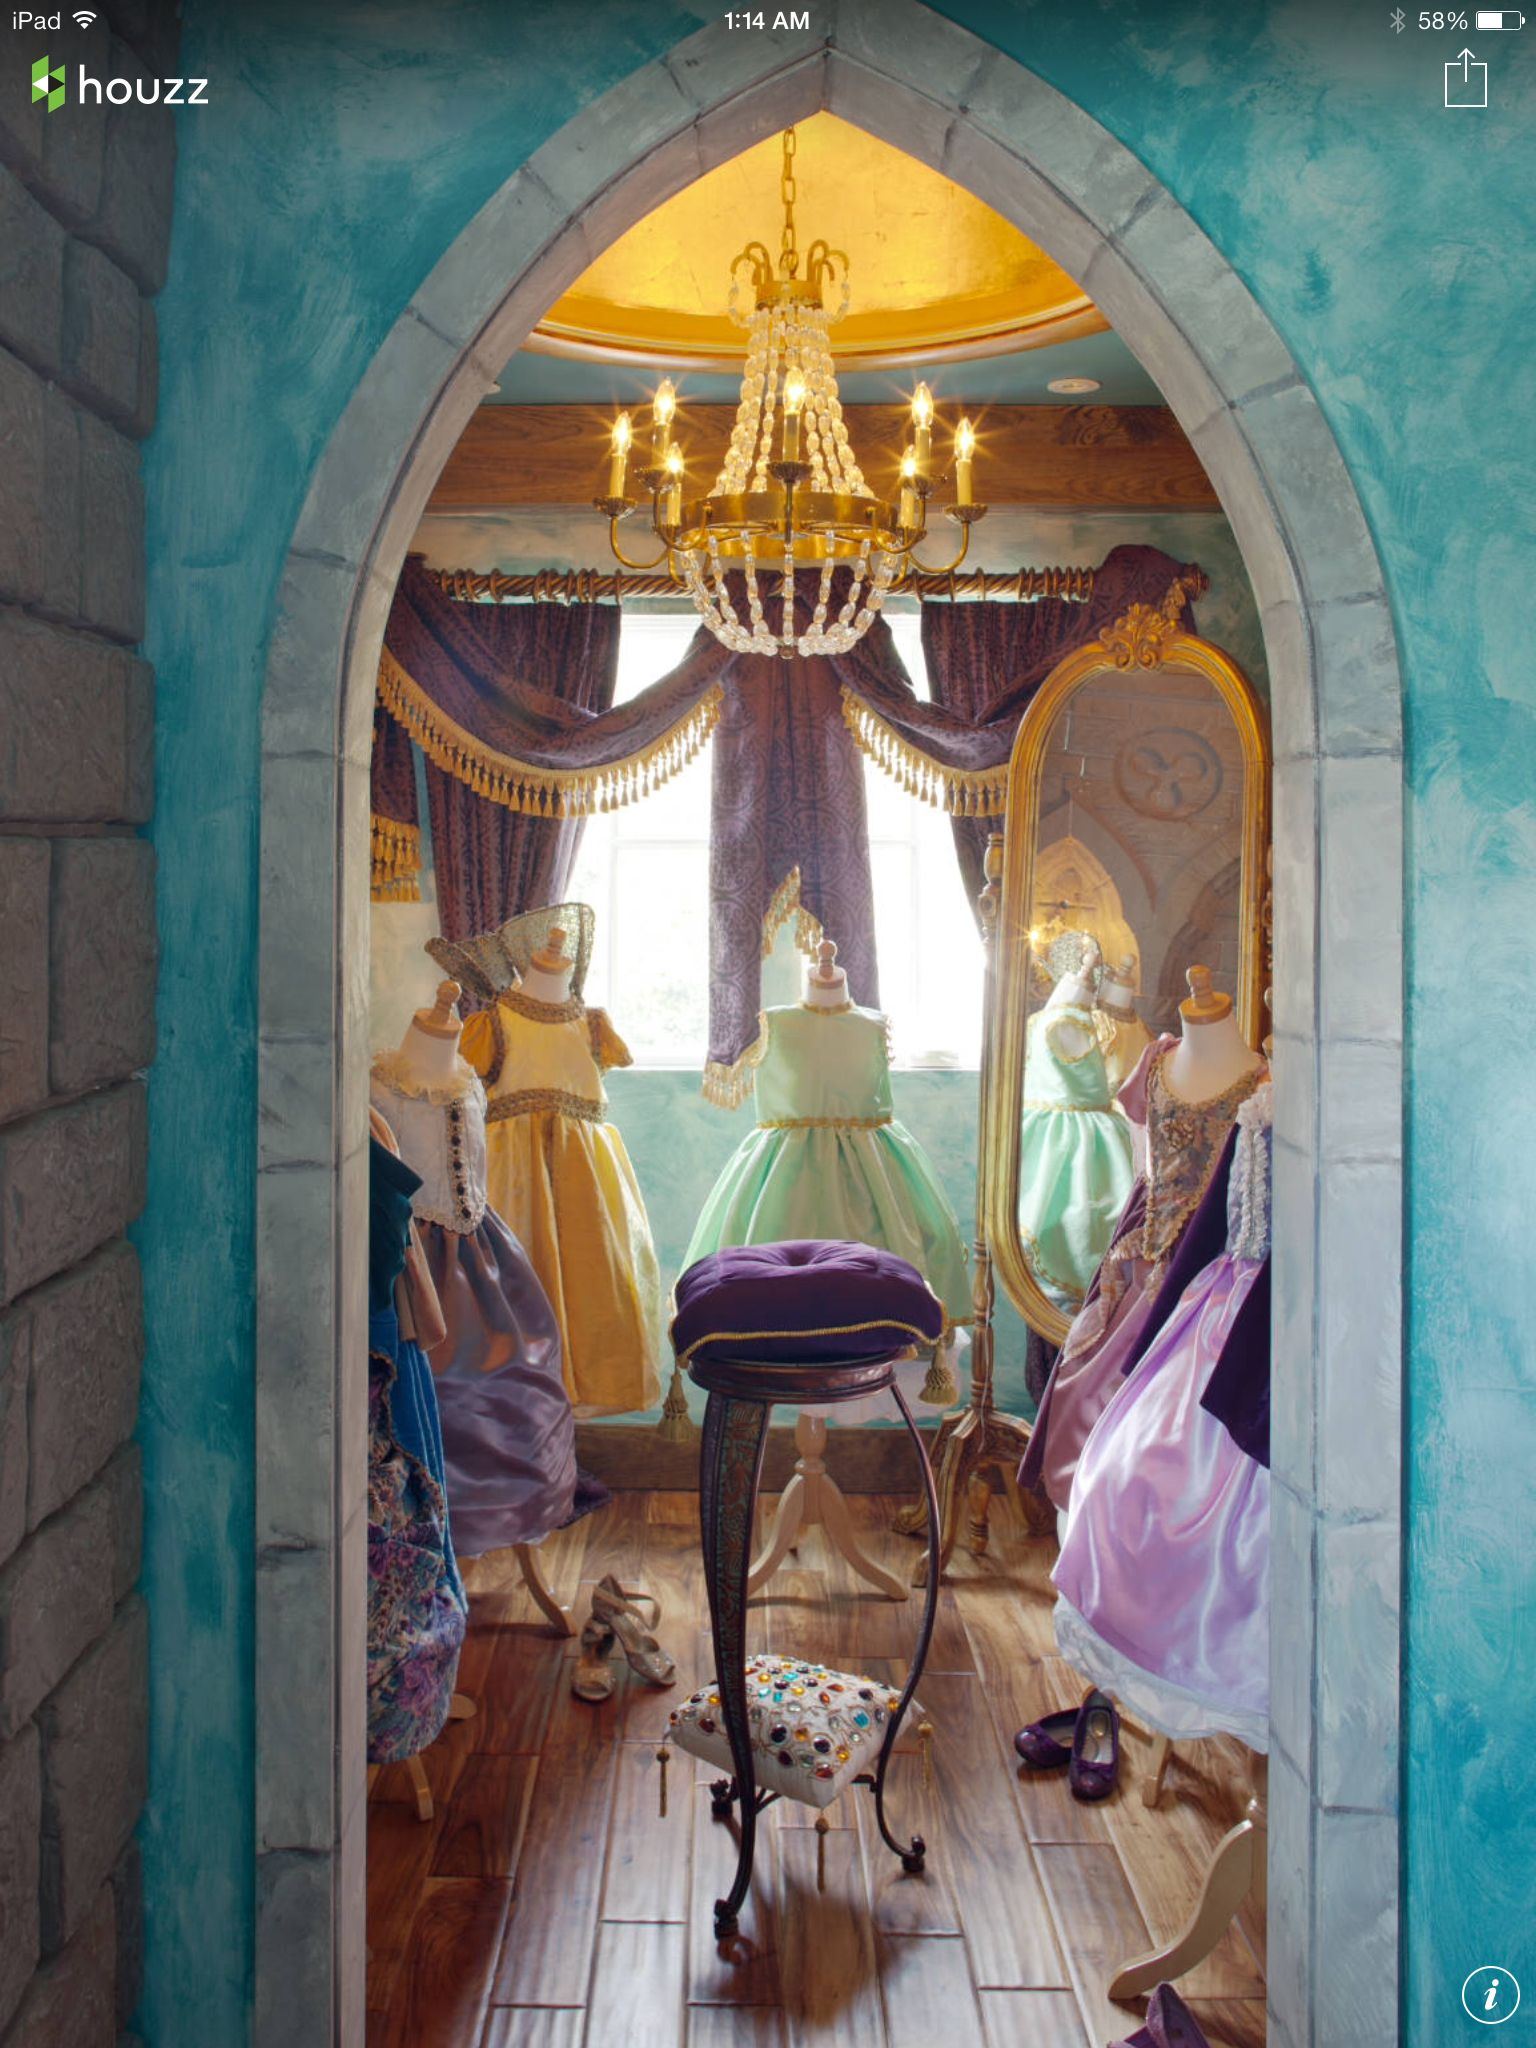 looks like the perfect princess room-adults allowed